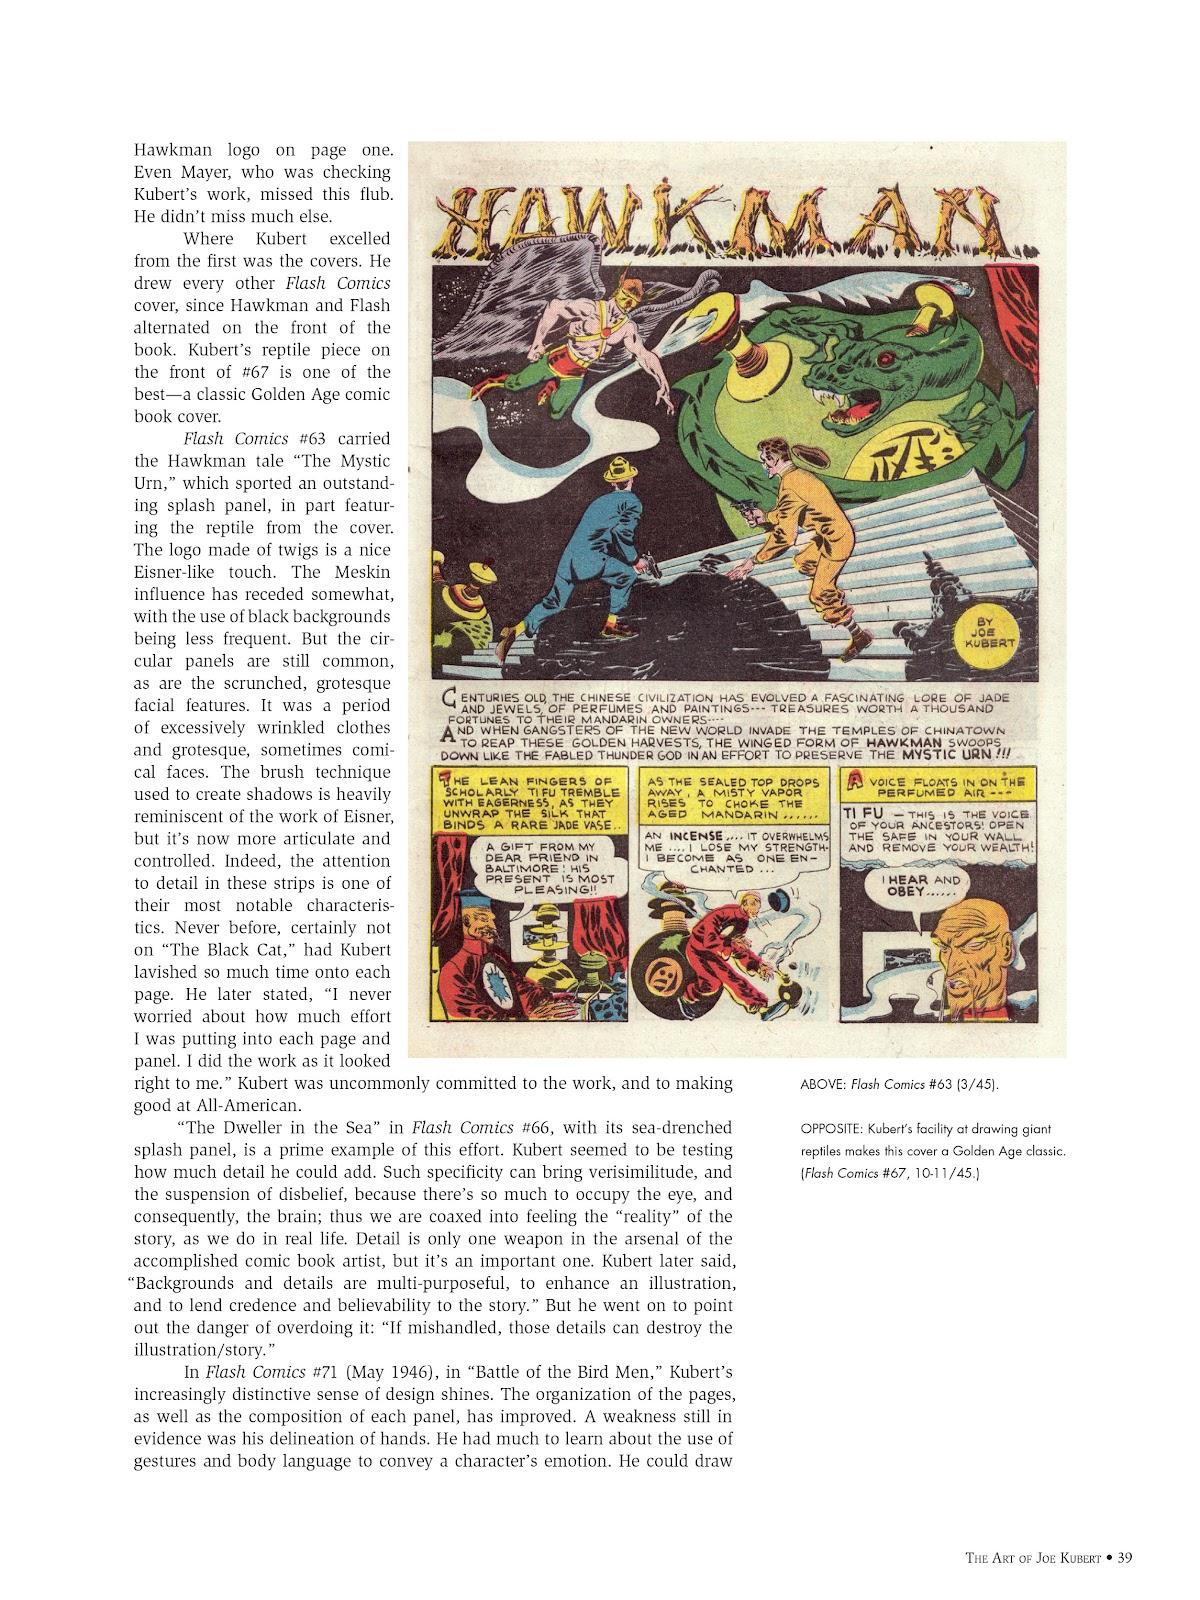 Read online The Art of Joe Kubert comic -  Issue # TPB (Part 1) - 38